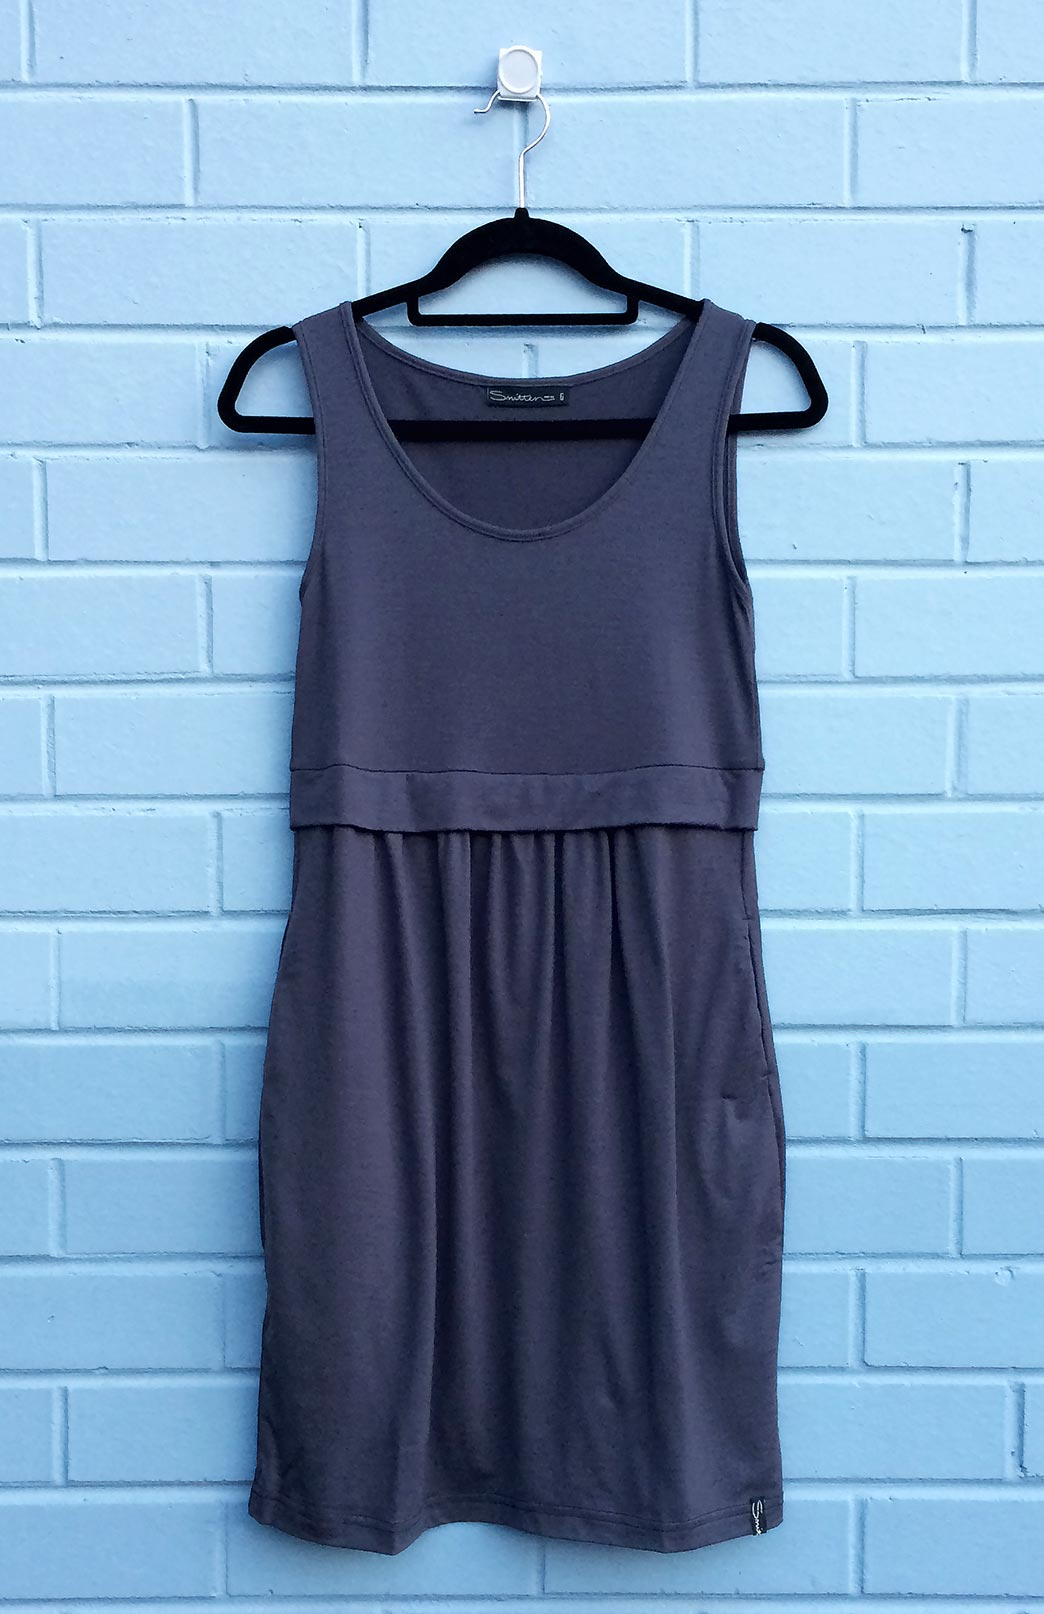 Tulip Dress - Women's Steel Grey Merino Wool Fitted Tulip Dress with Side Pockets - Smitten Merino Tasmania Australia